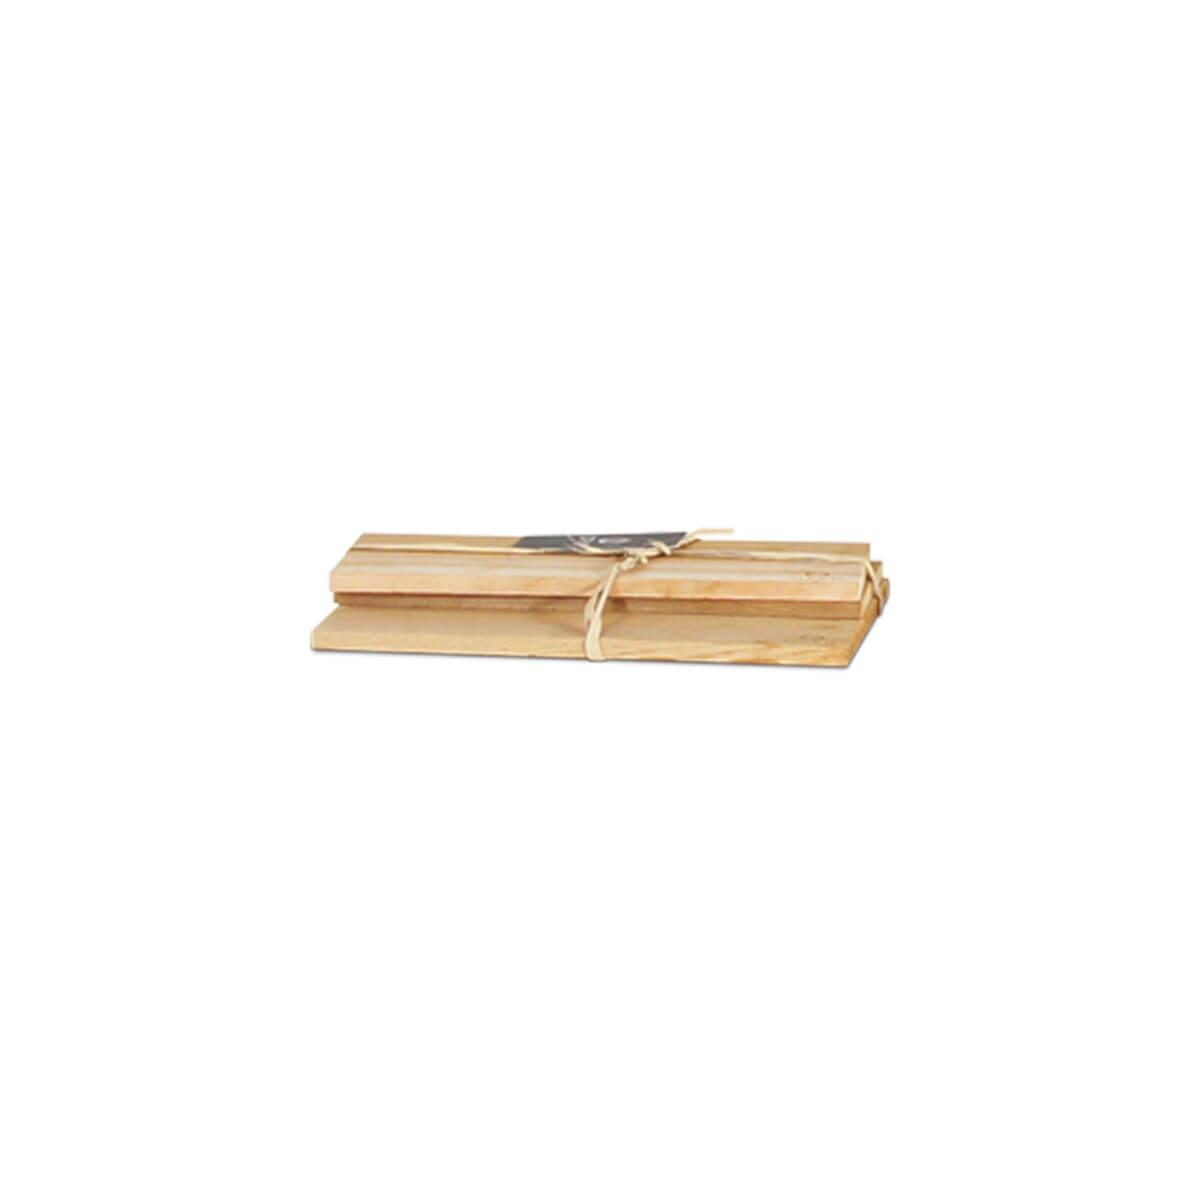 Holzplanken aus Zederholz